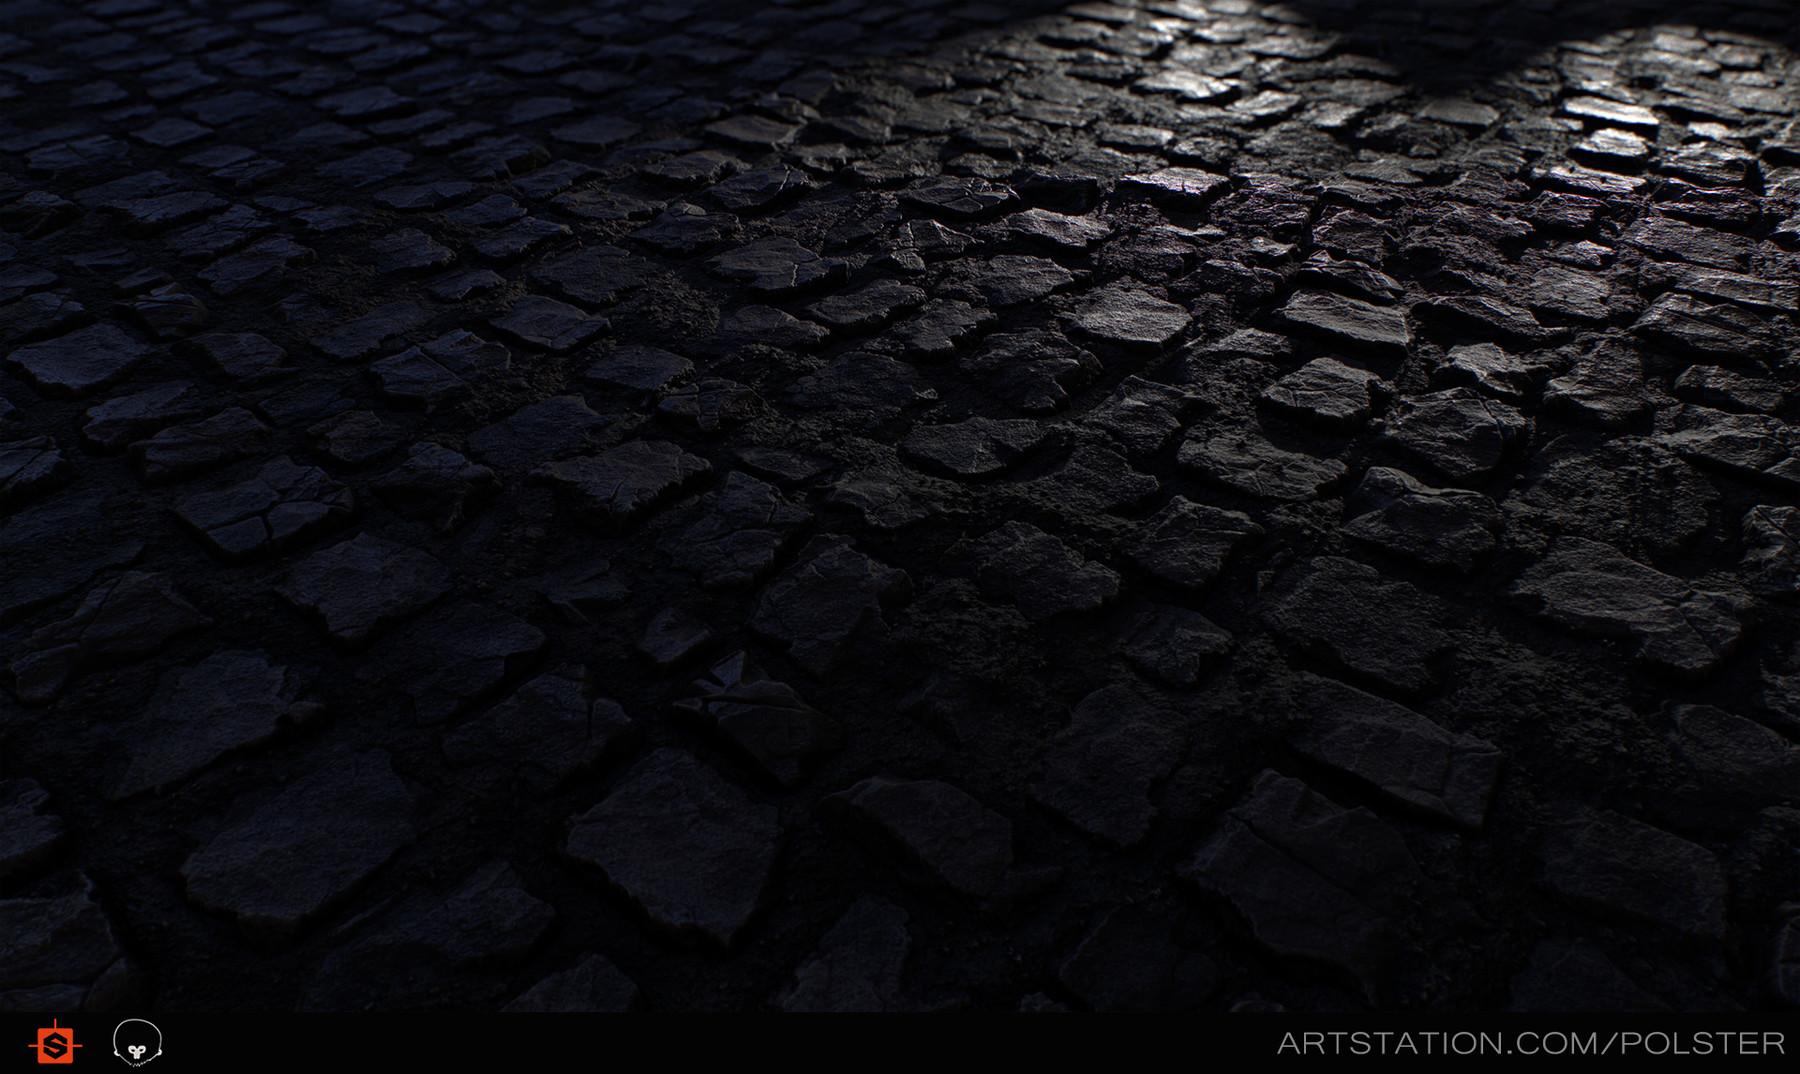 Rough cobblestone headlights